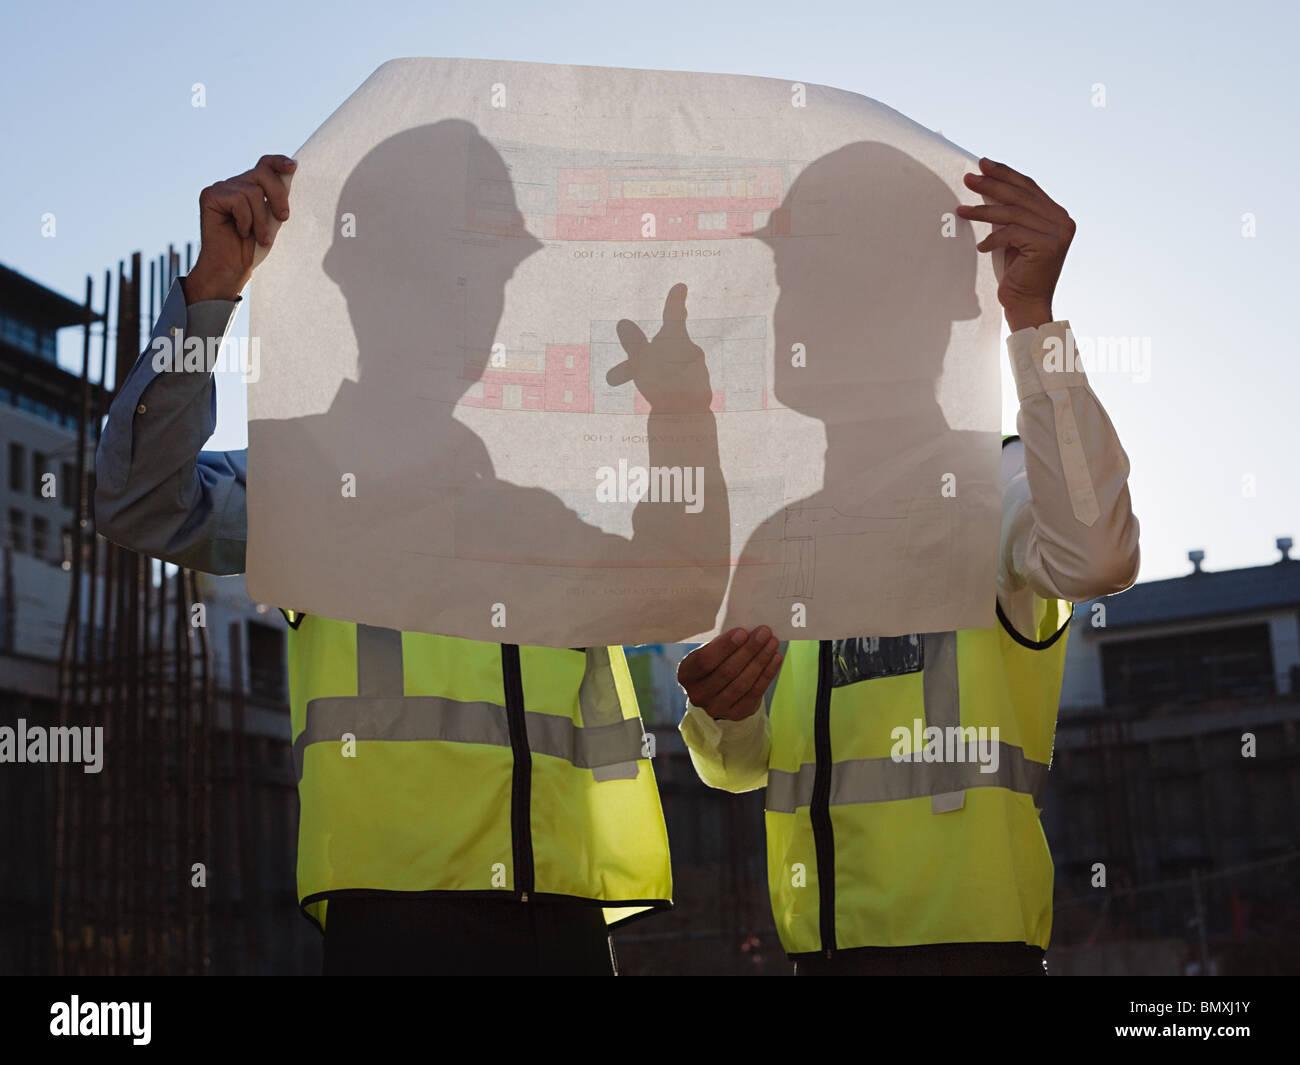 Reife Männer mit Blaupause auf Baustelle Stockbild